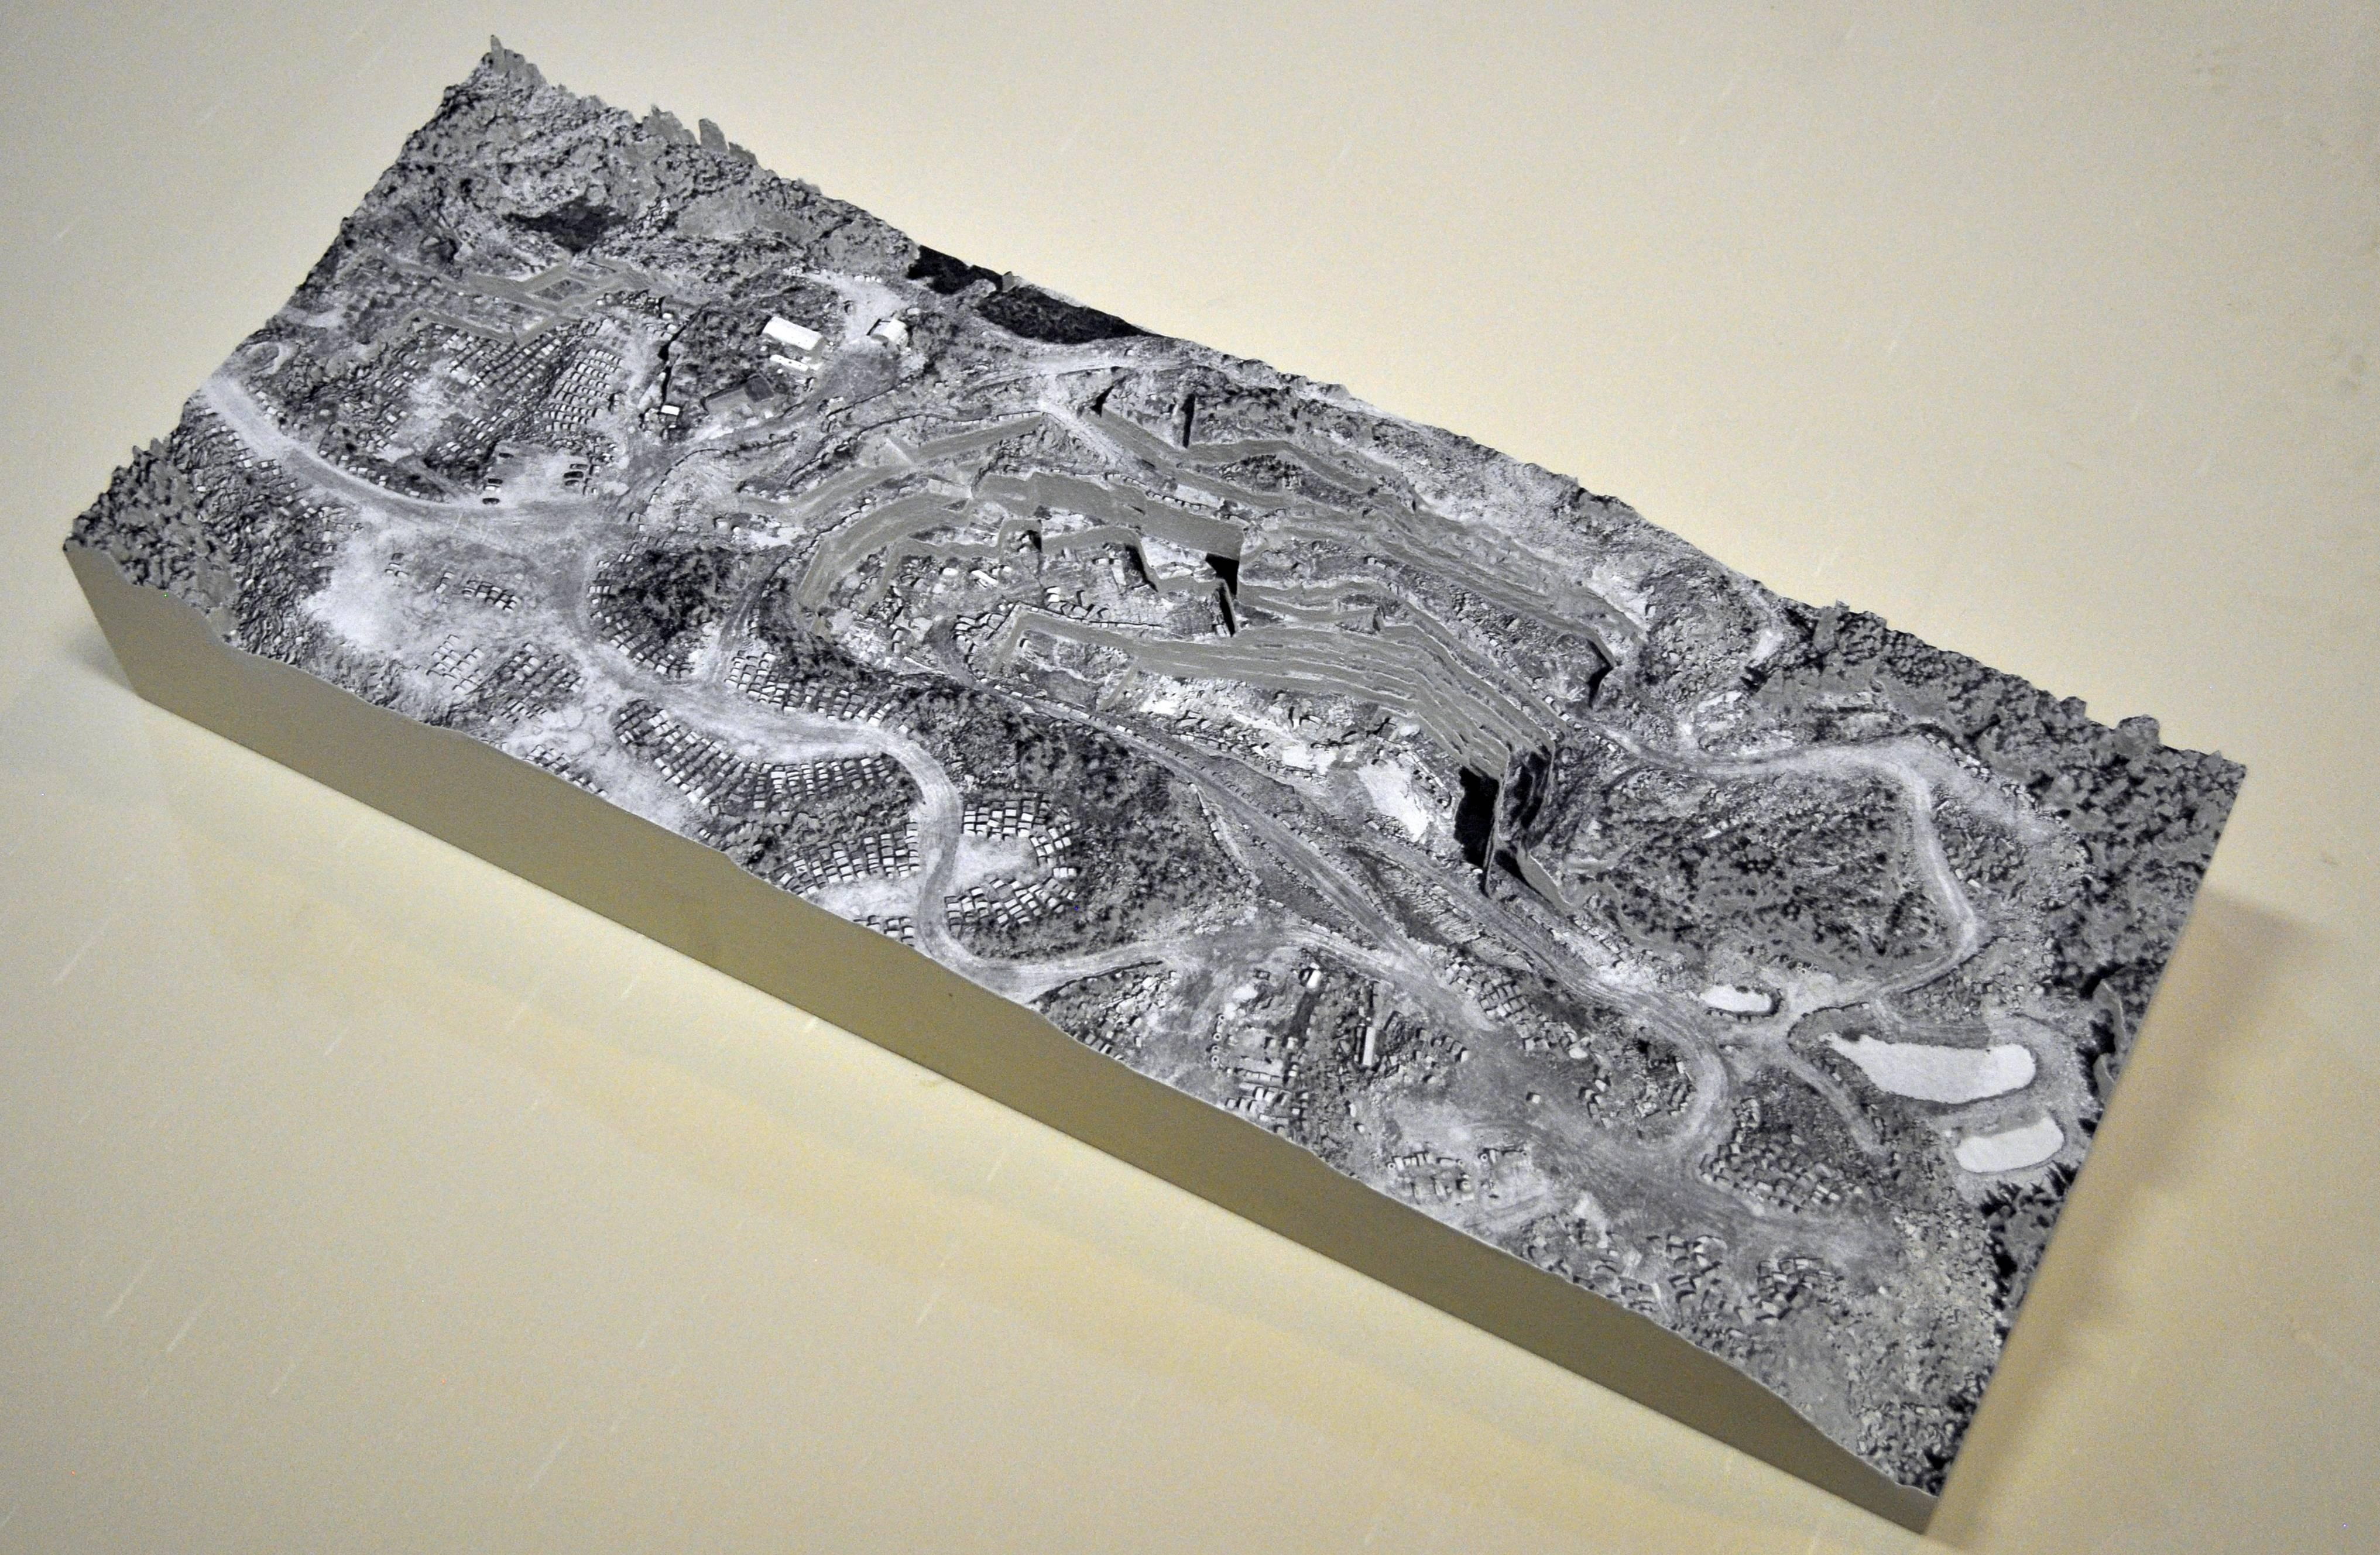 Spectacular Quarry